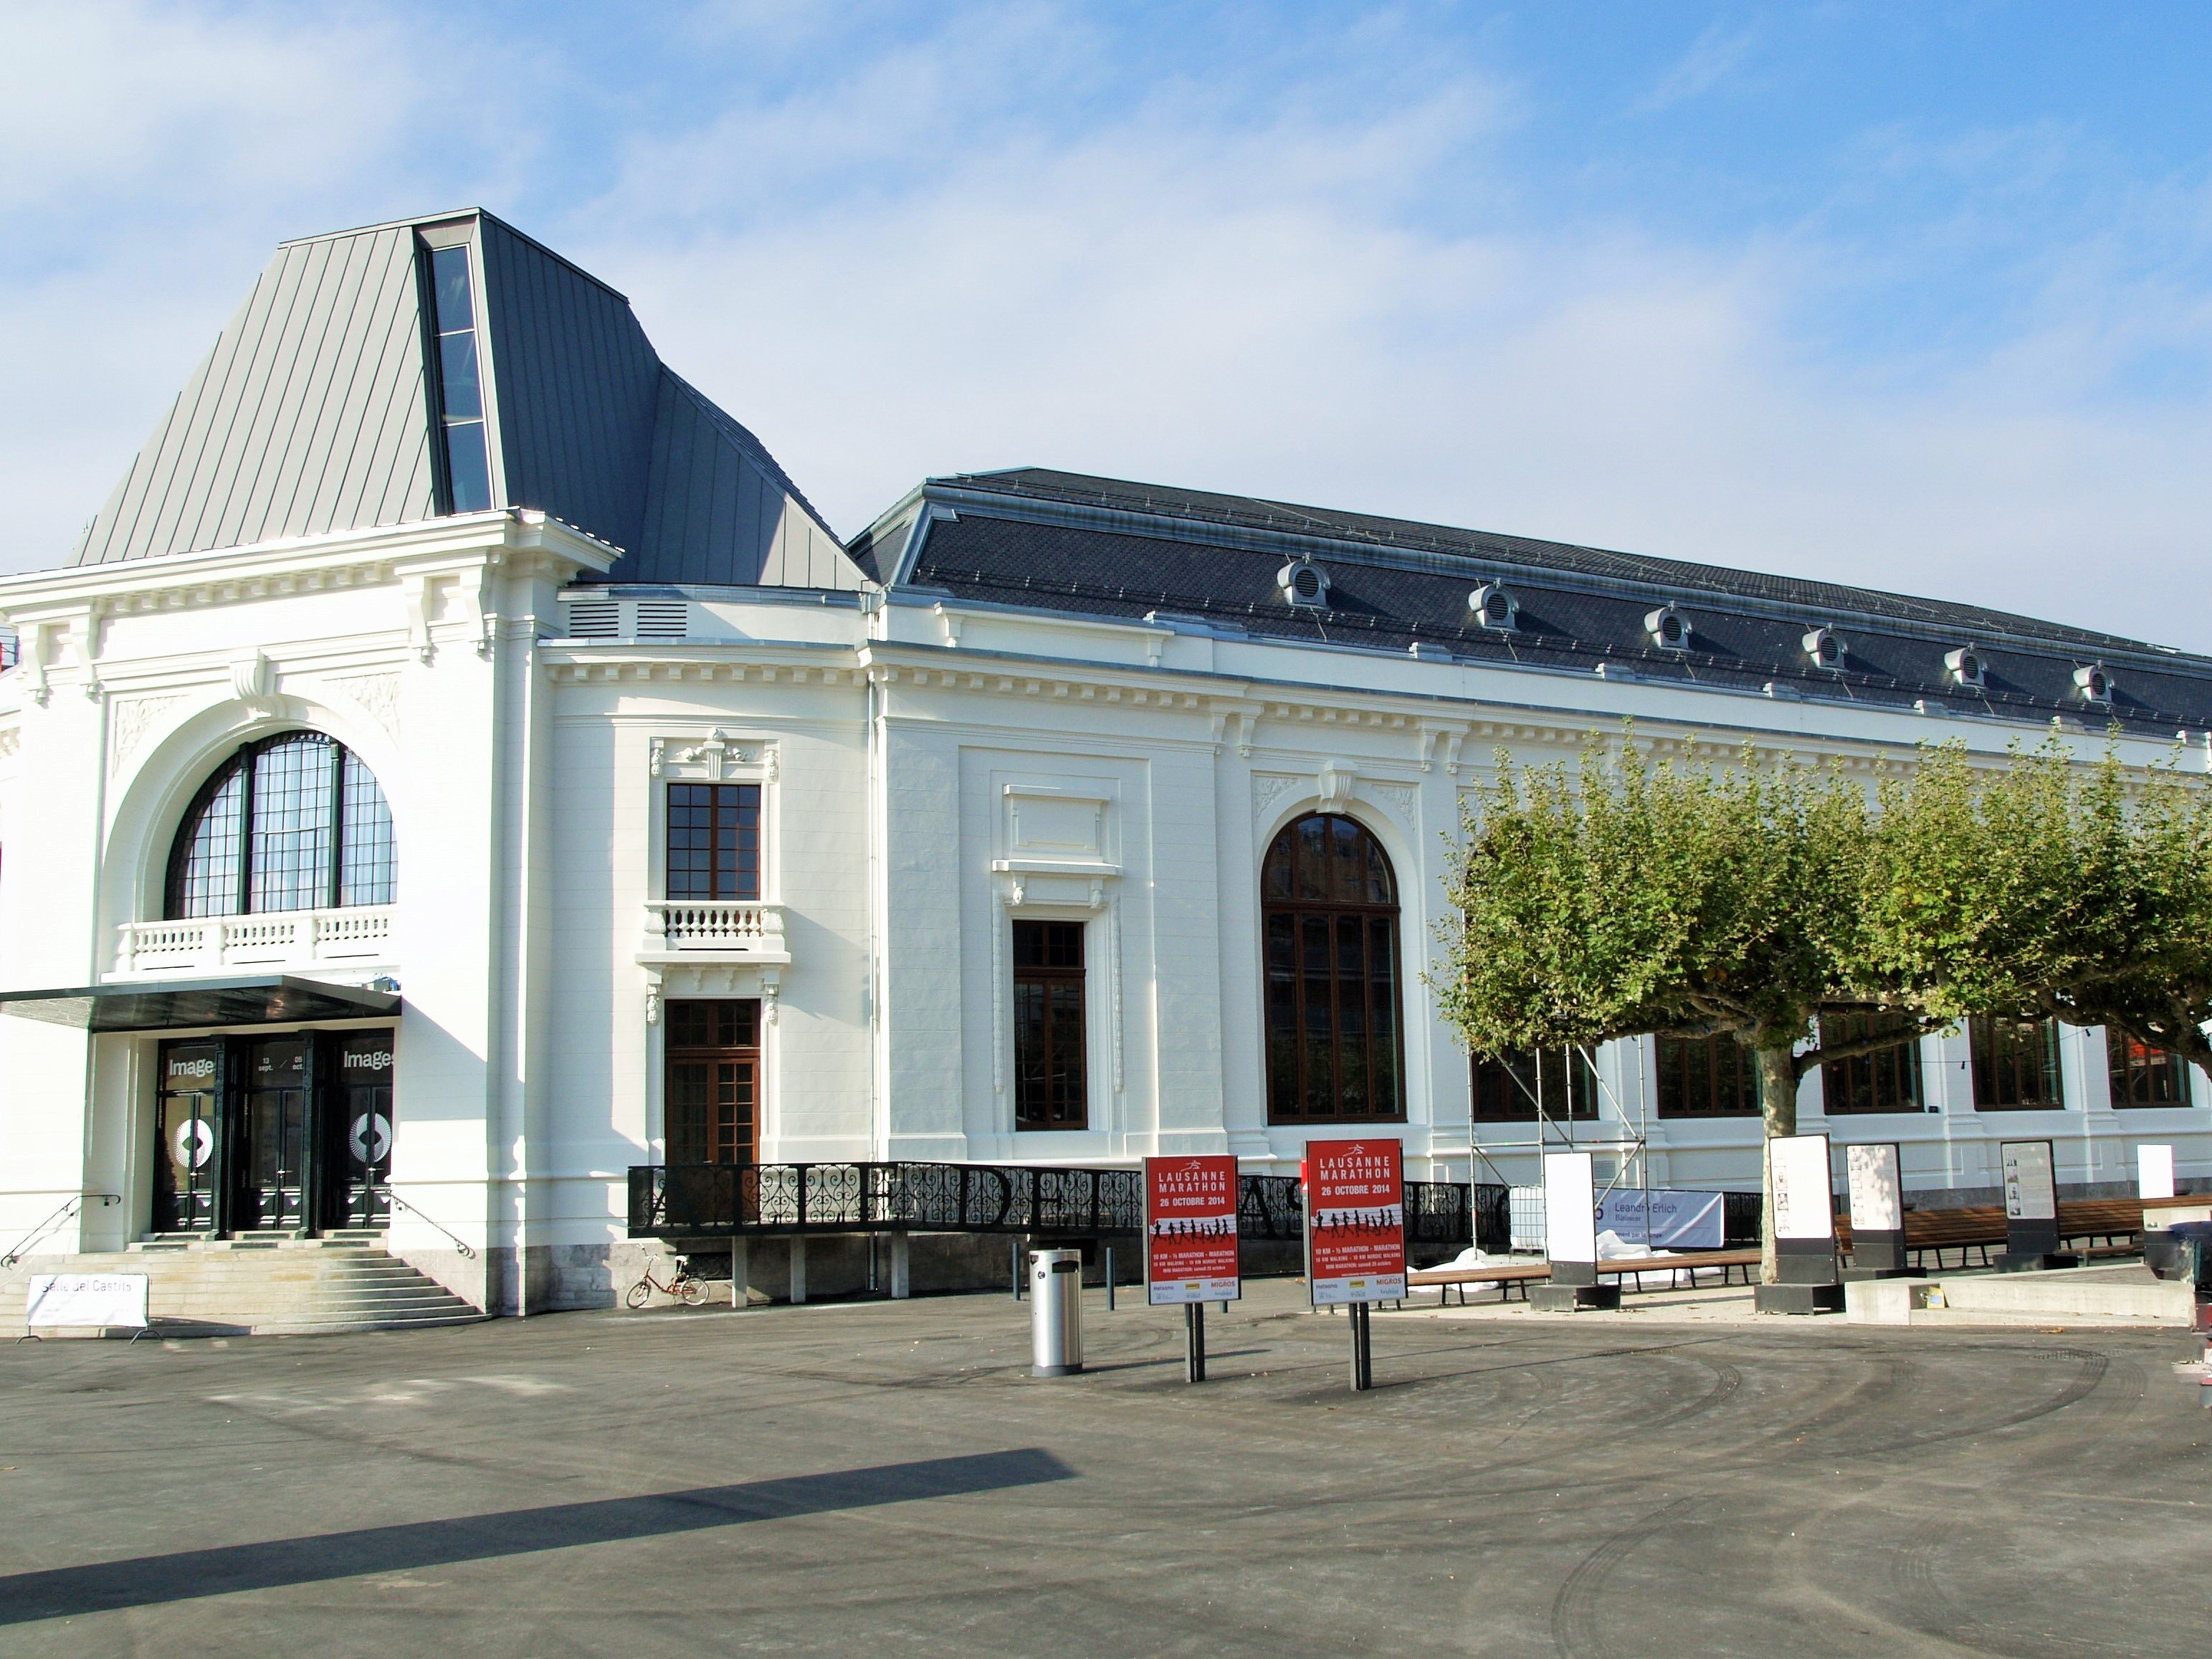 2015 Vevey, Salle del Castillo